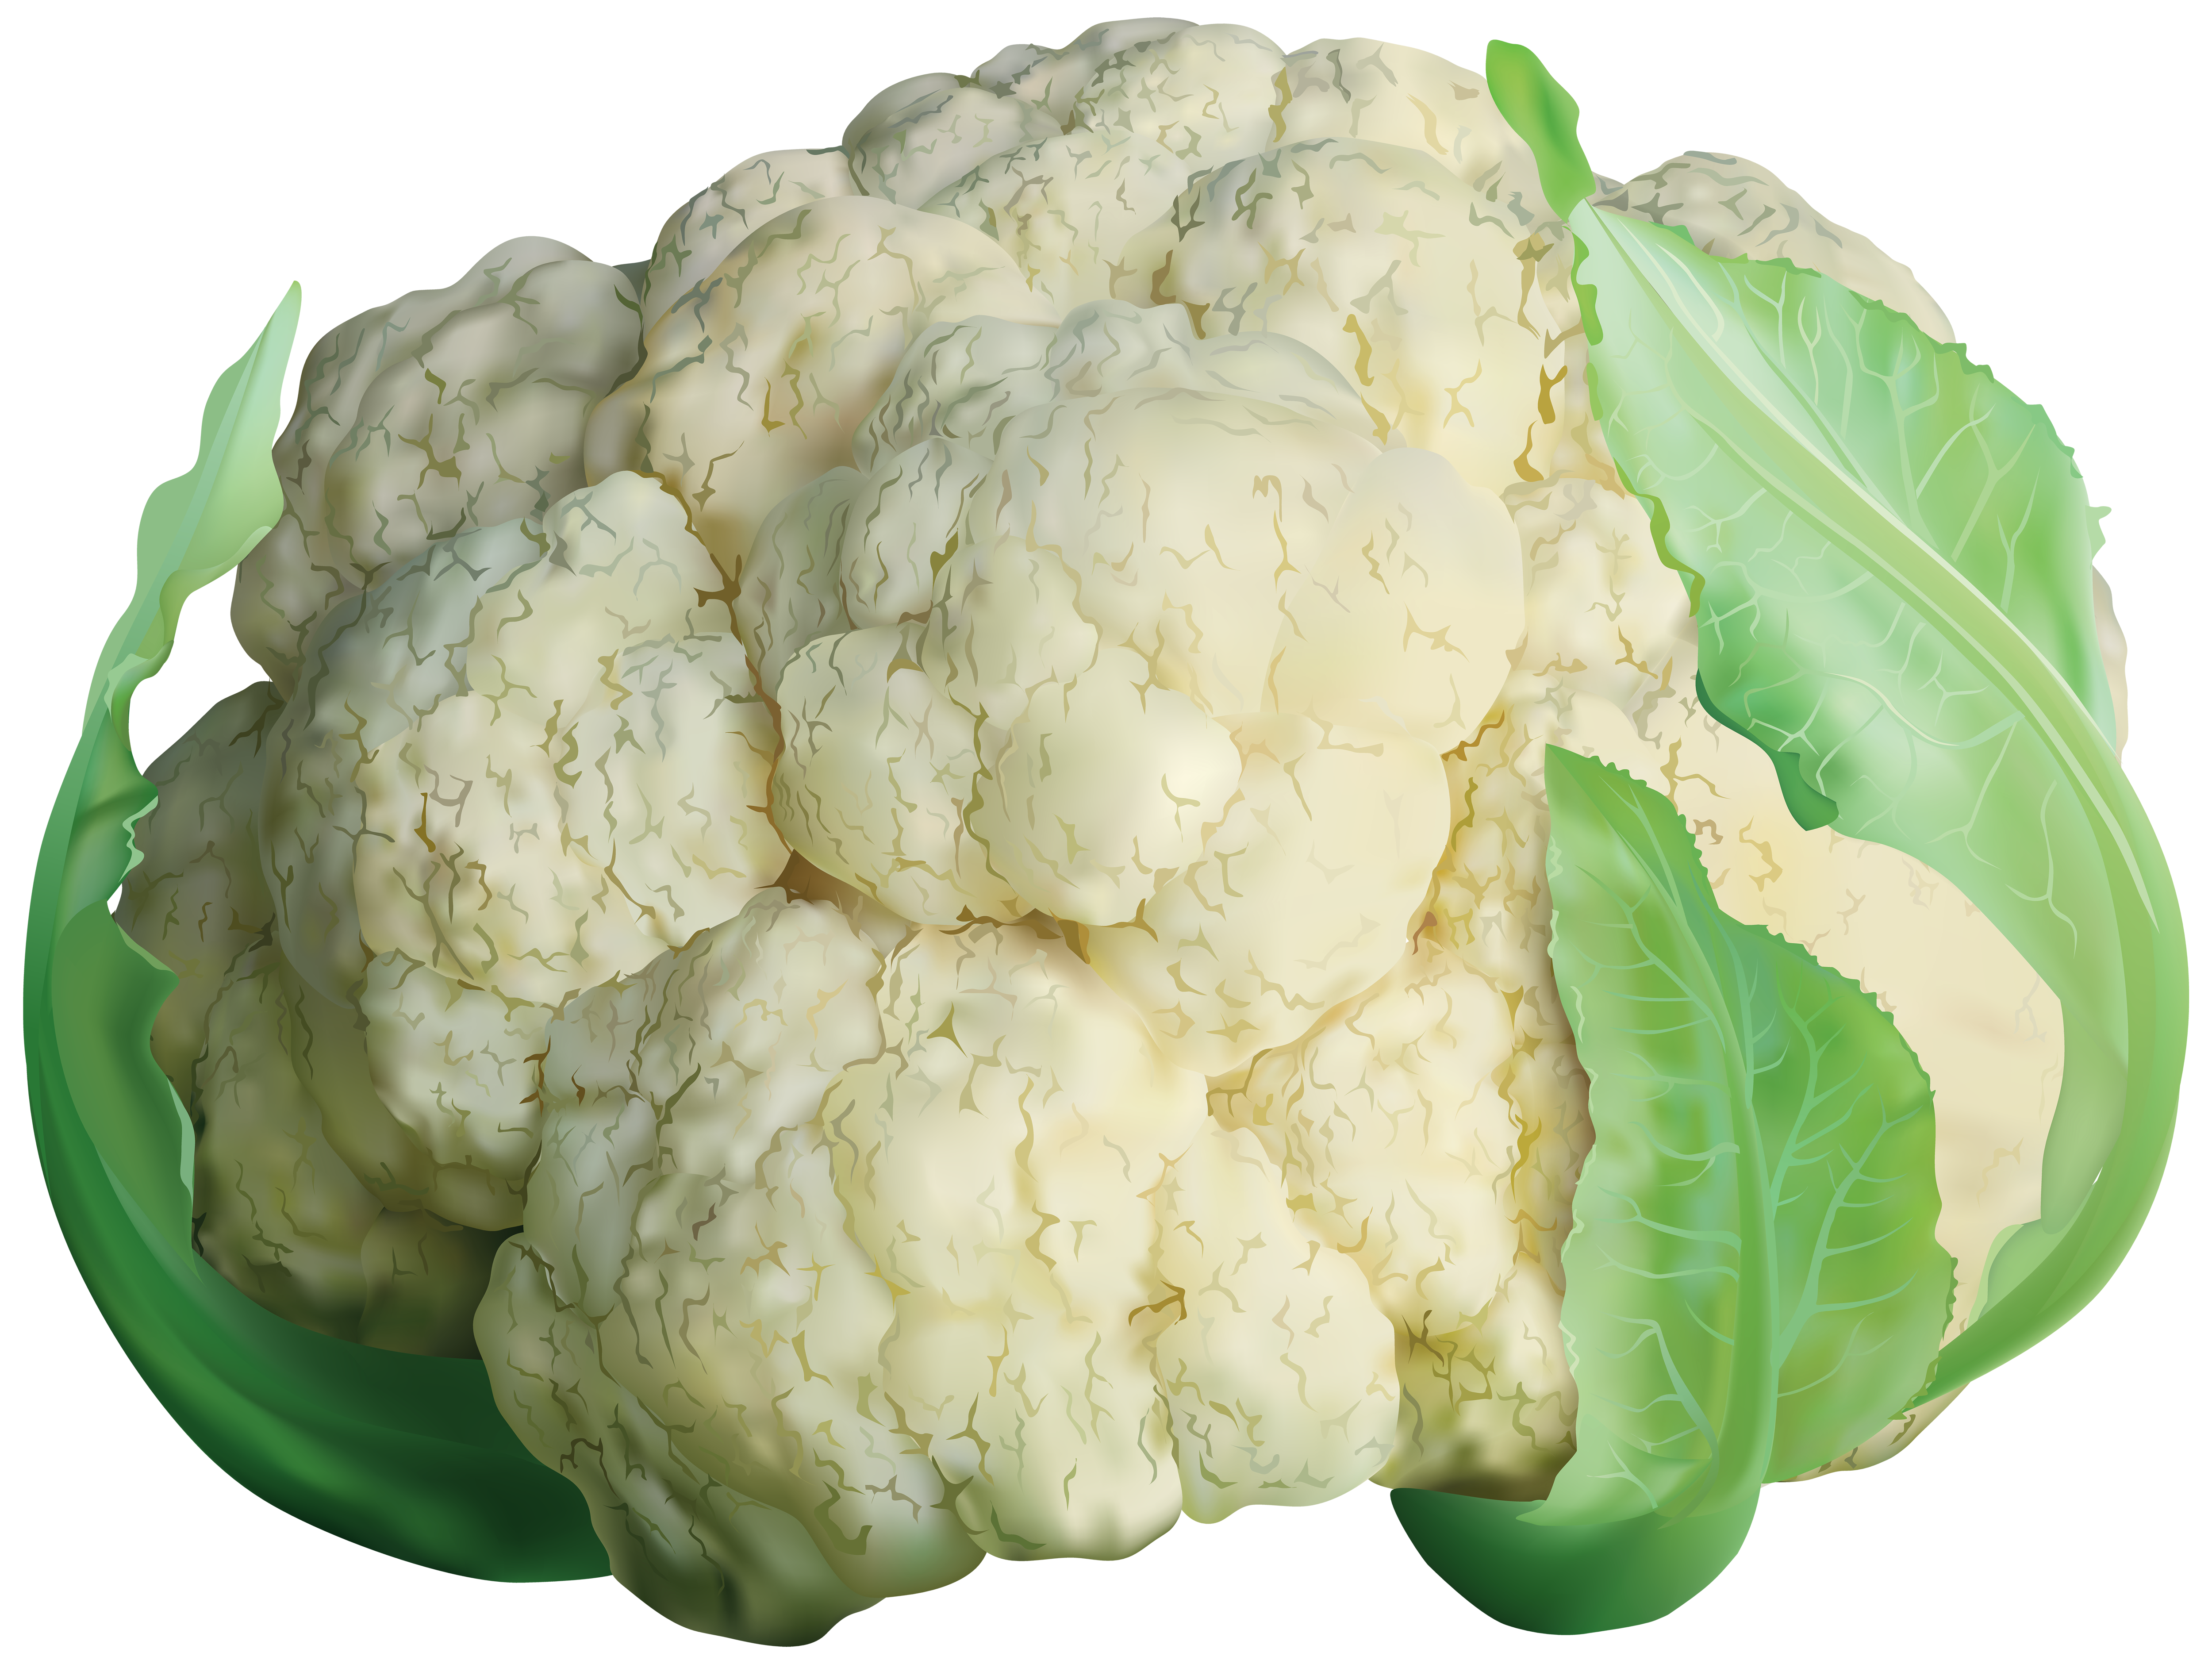 Cabbage clipart cauliflower. Transparent png clip art